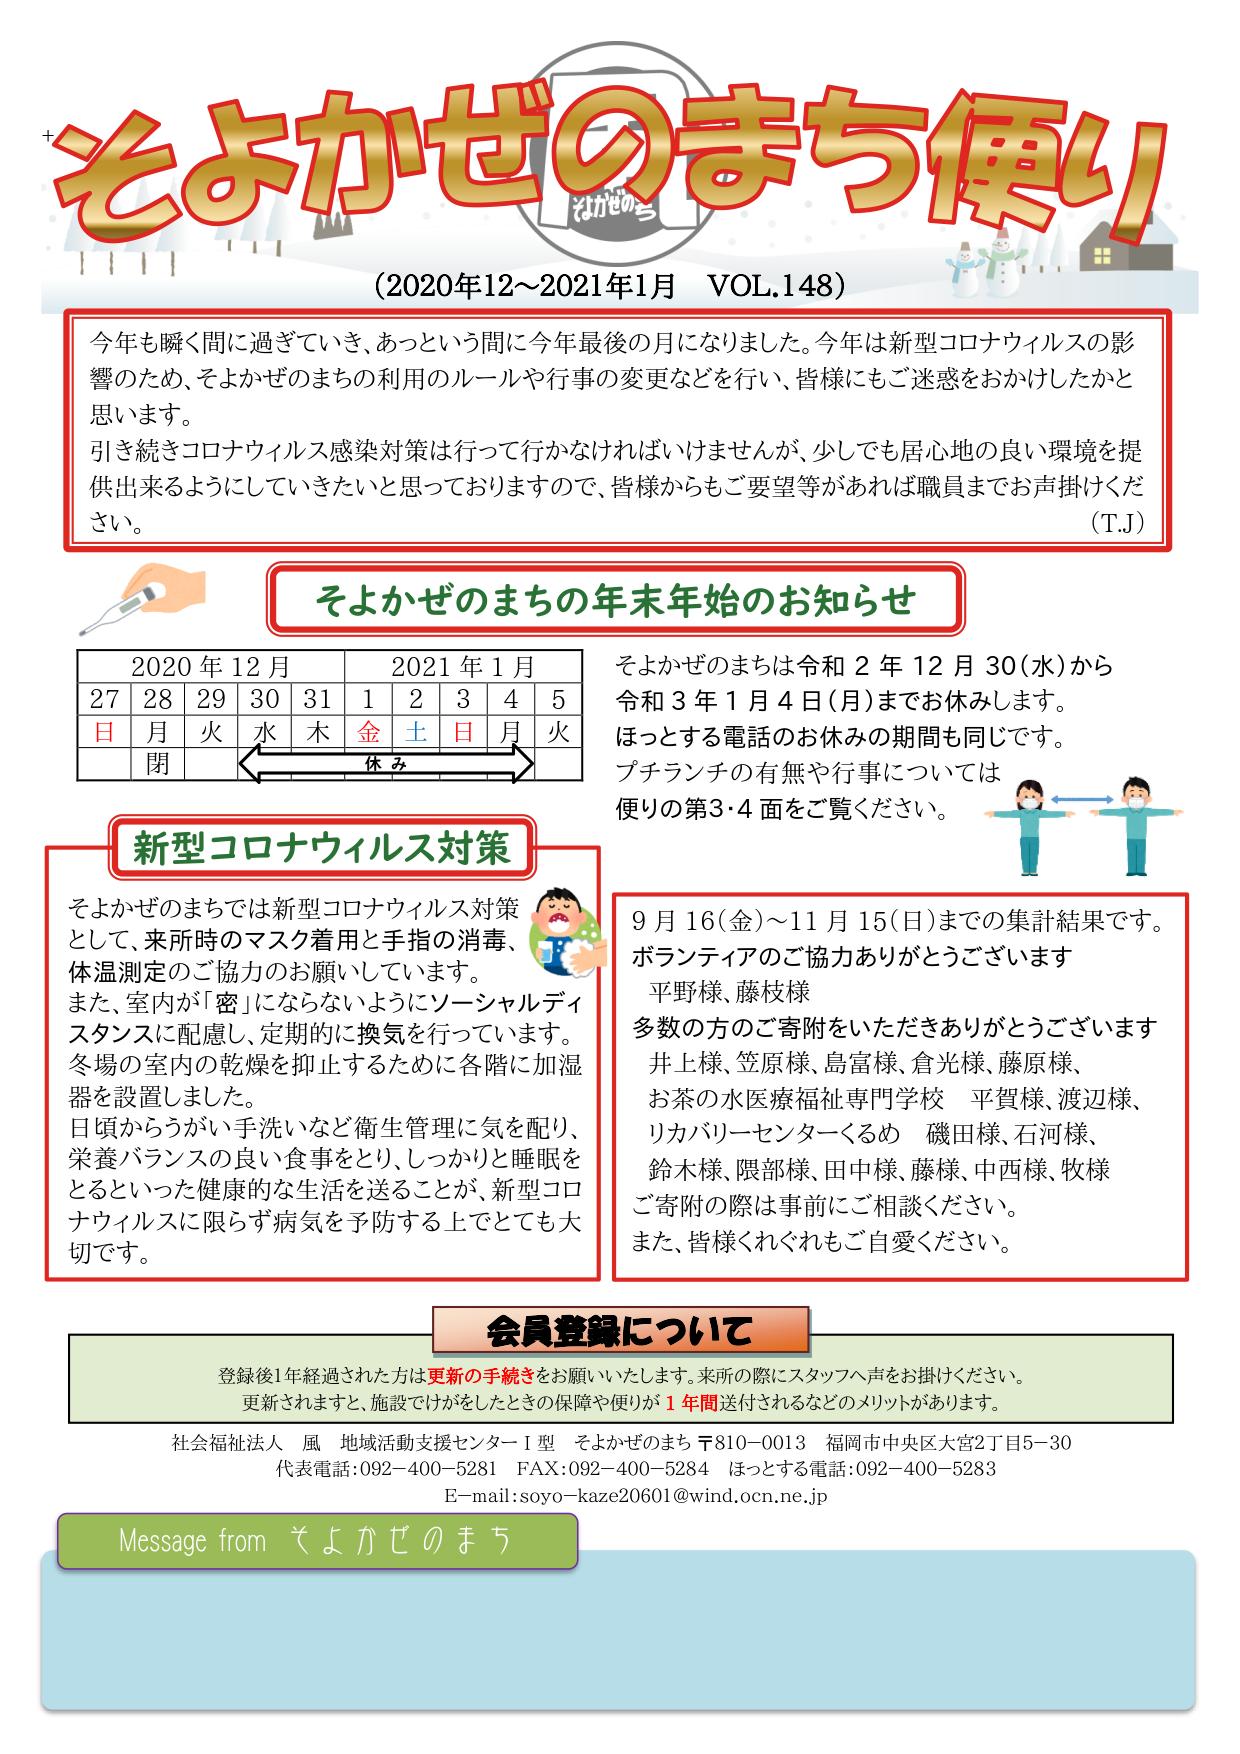 2020-12-2021-01-01